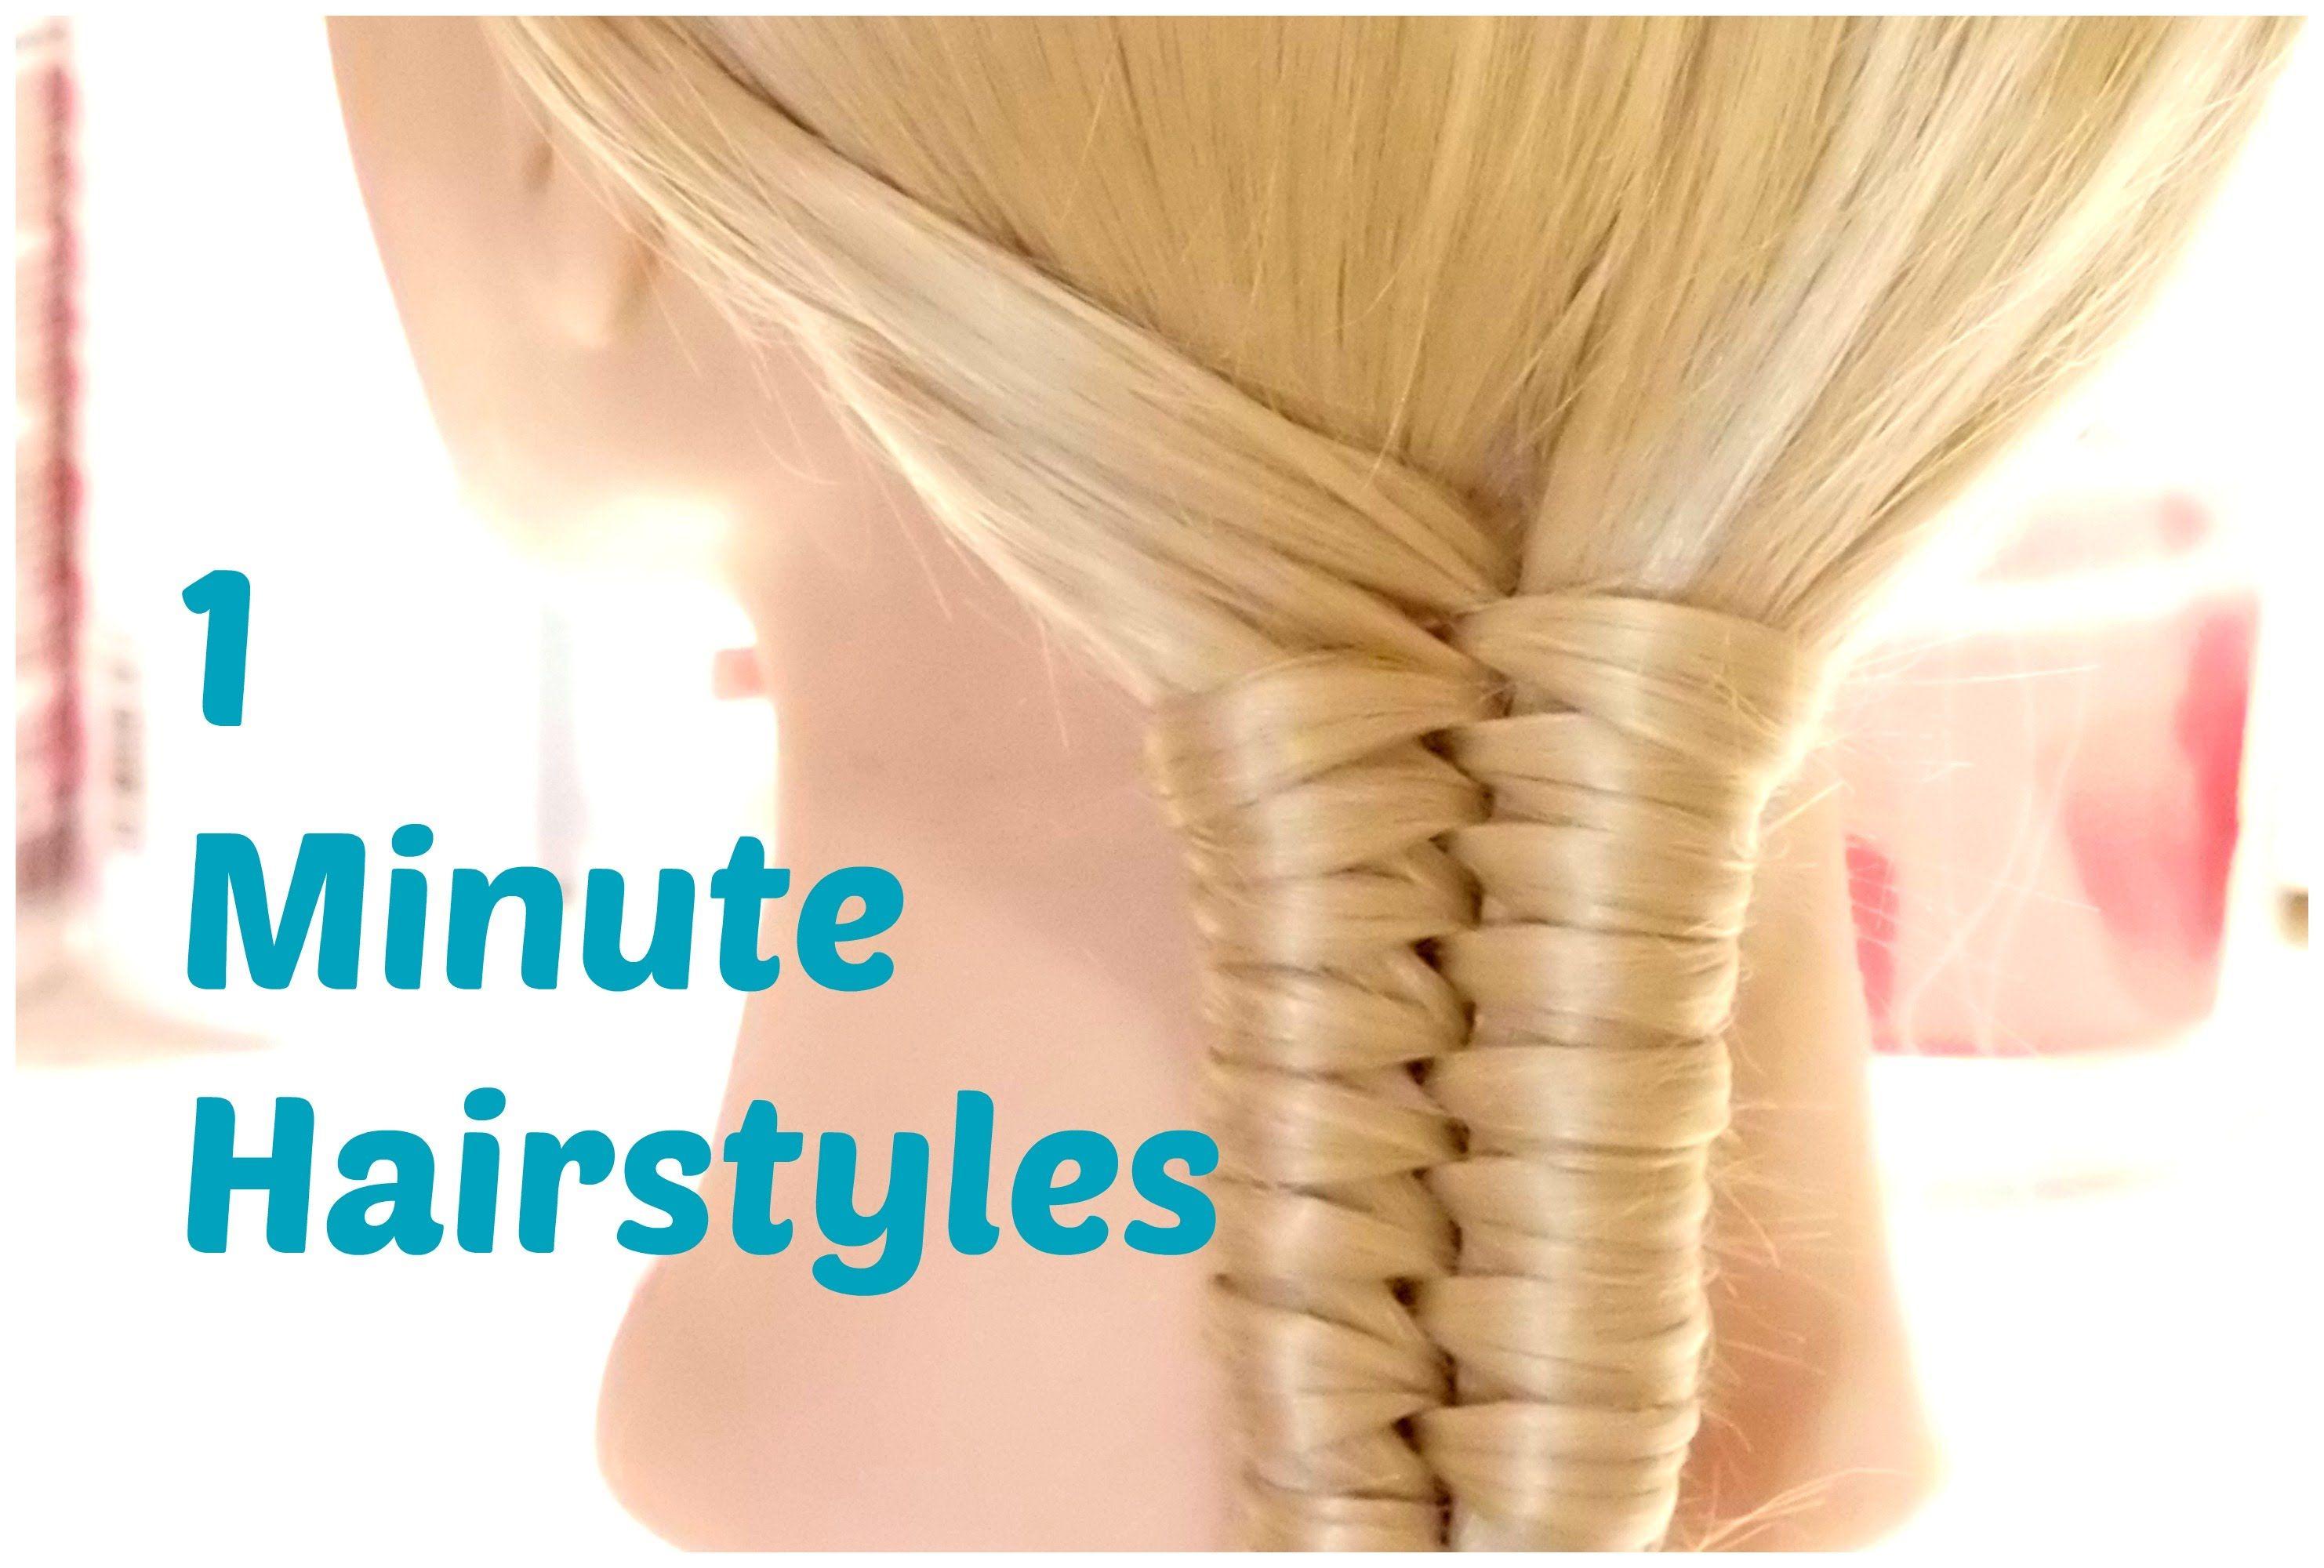 2 Minute Hairstyles 1 Minute Hairstyles  Easy Summer Hairstyles  Crix Tutorials  Hair